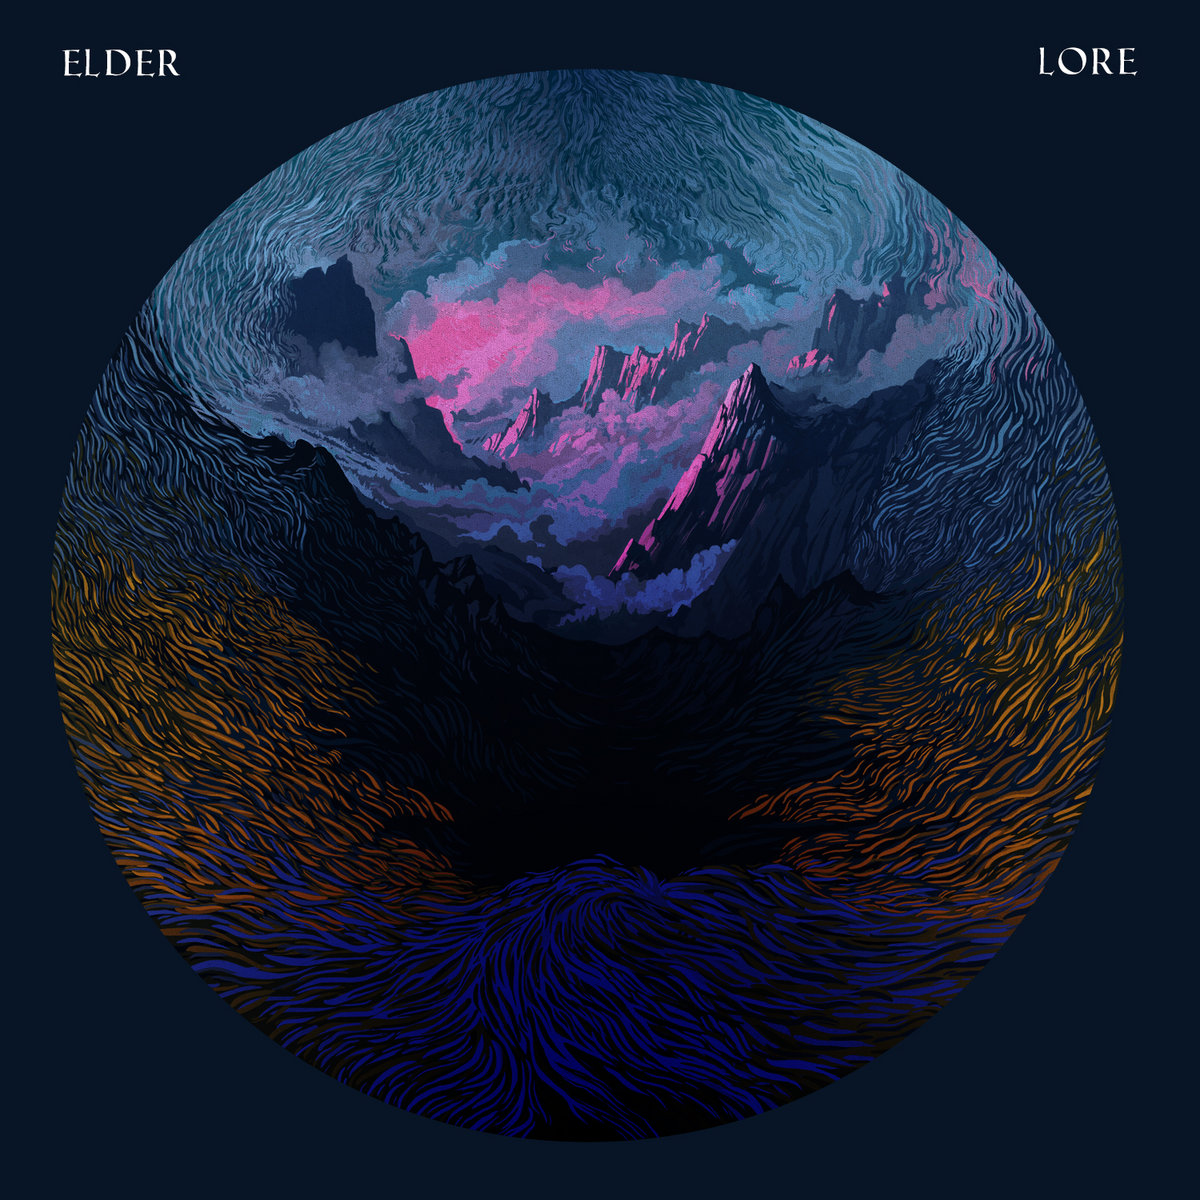 Elder - The future of heavy rock?